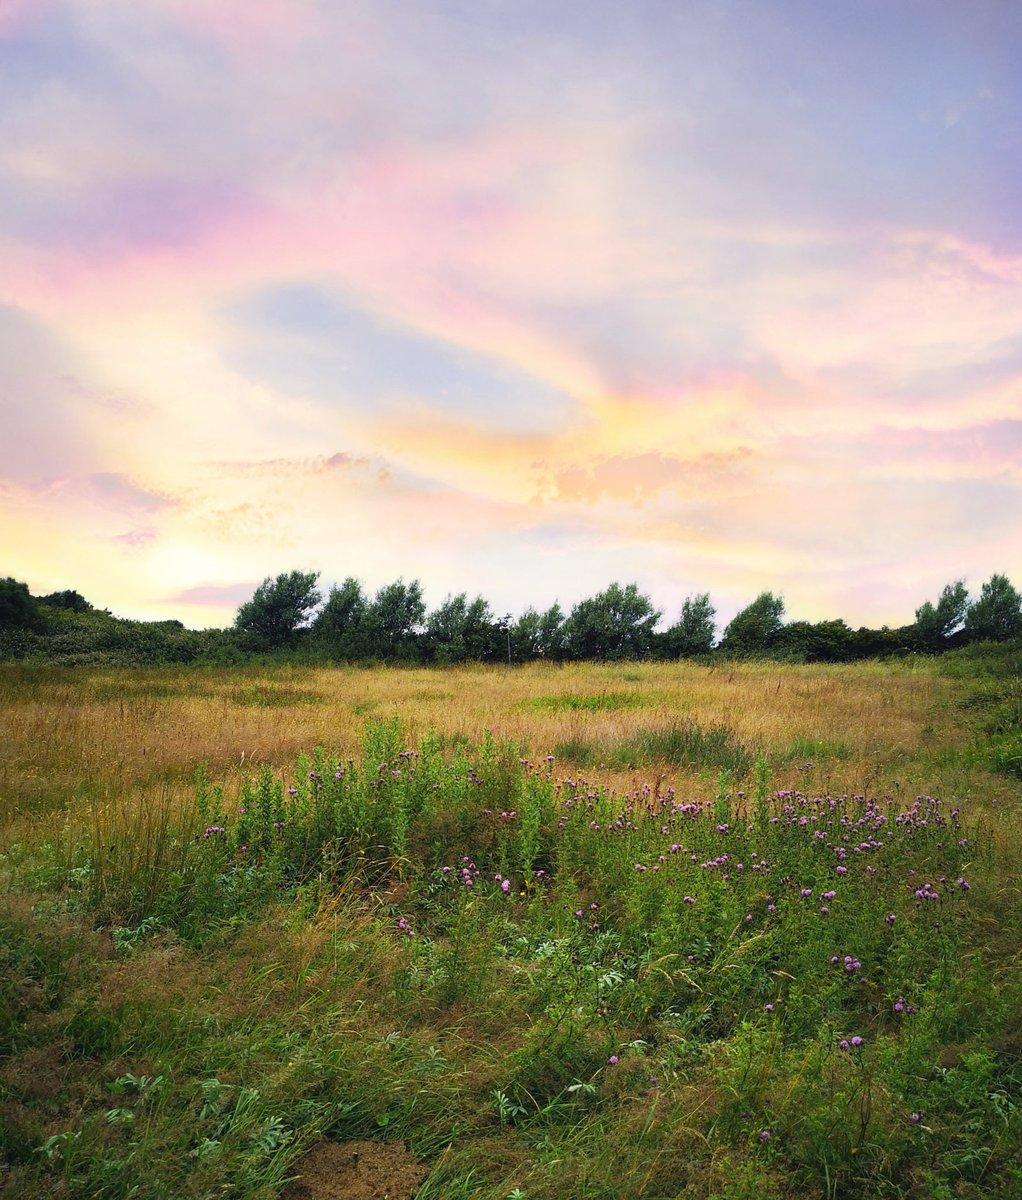 Just a few simple field flowers from North Walney, Cumbria #wildflowerhour <br>http://pic.twitter.com/Uba1TolqTA